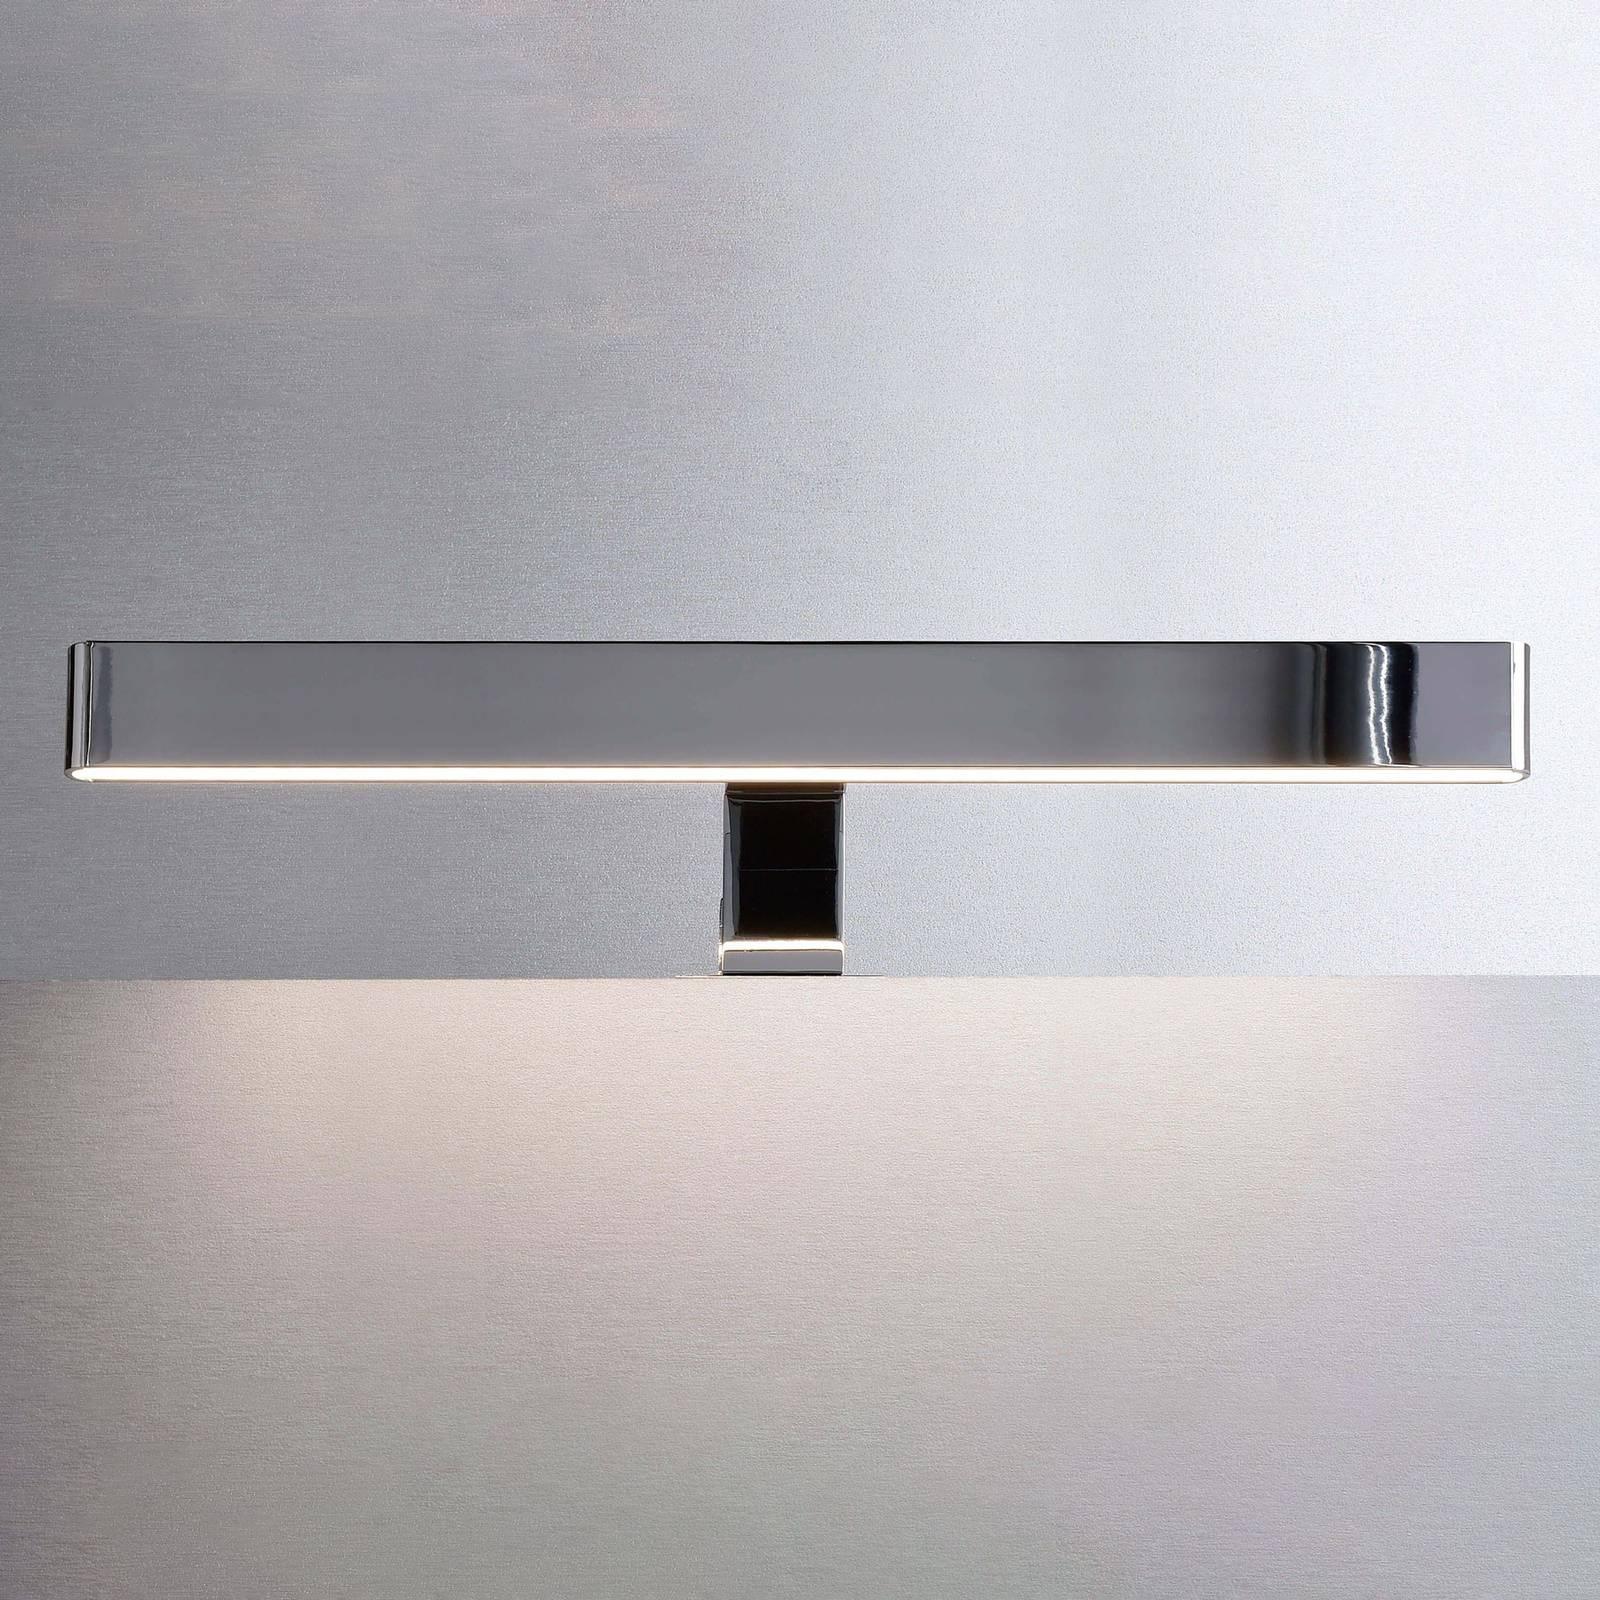 LED-kalustevalaisin Spiegel Line, 2 kpl, 12 W 51cm